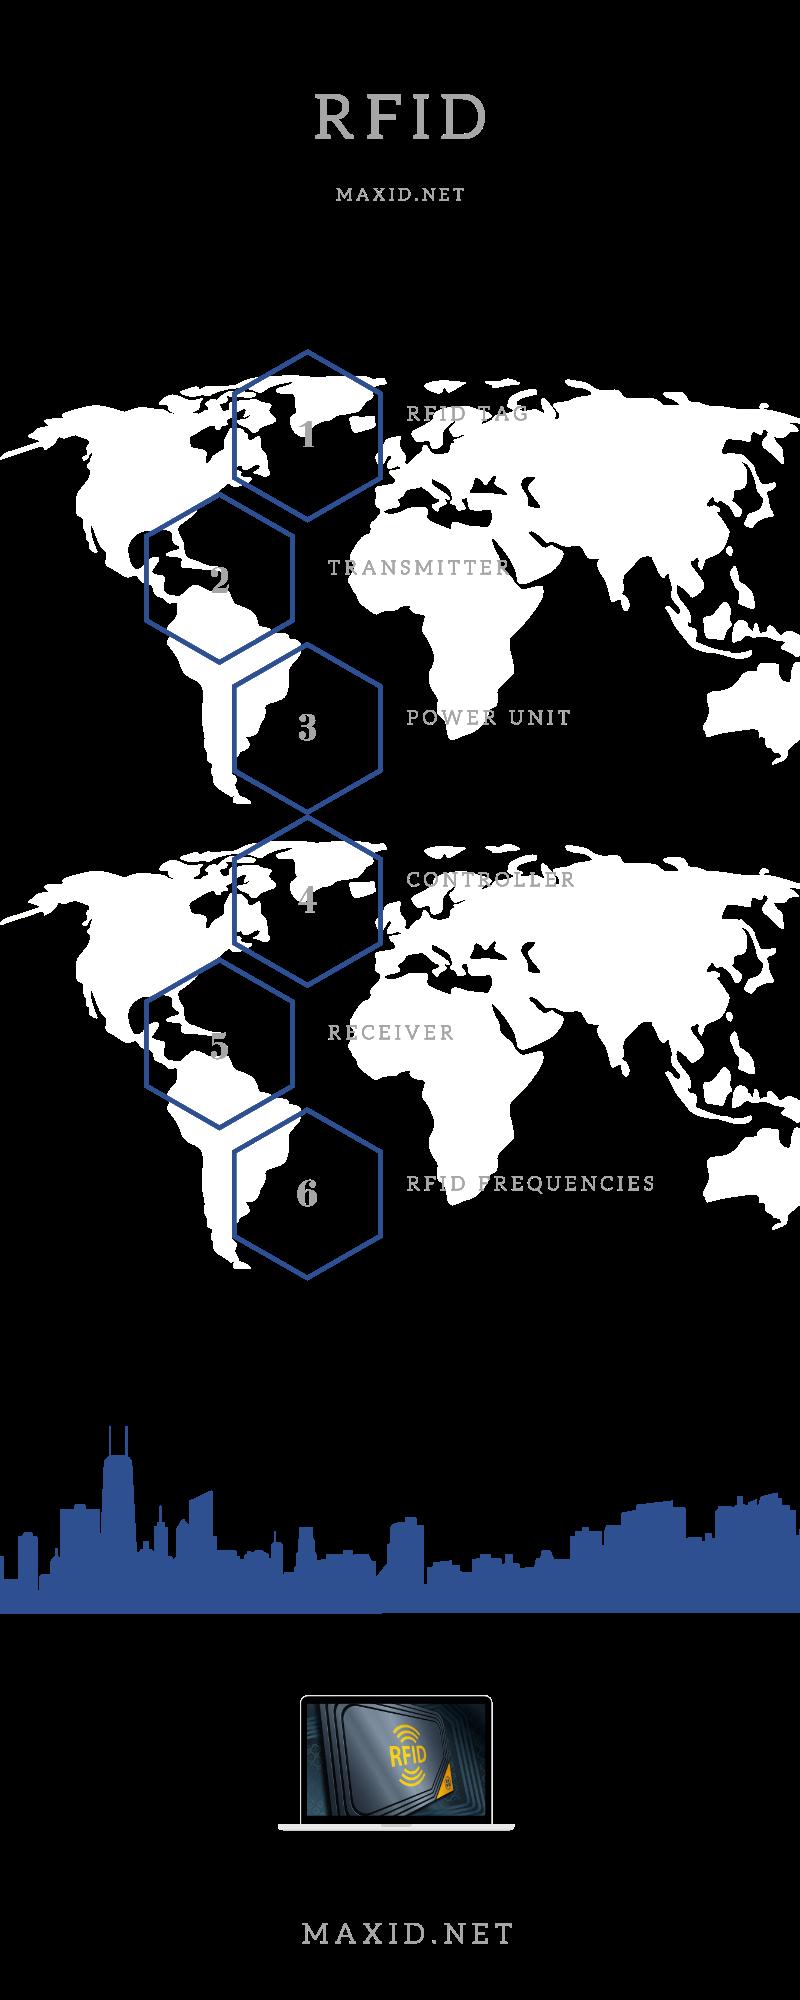 RFID-Infographic